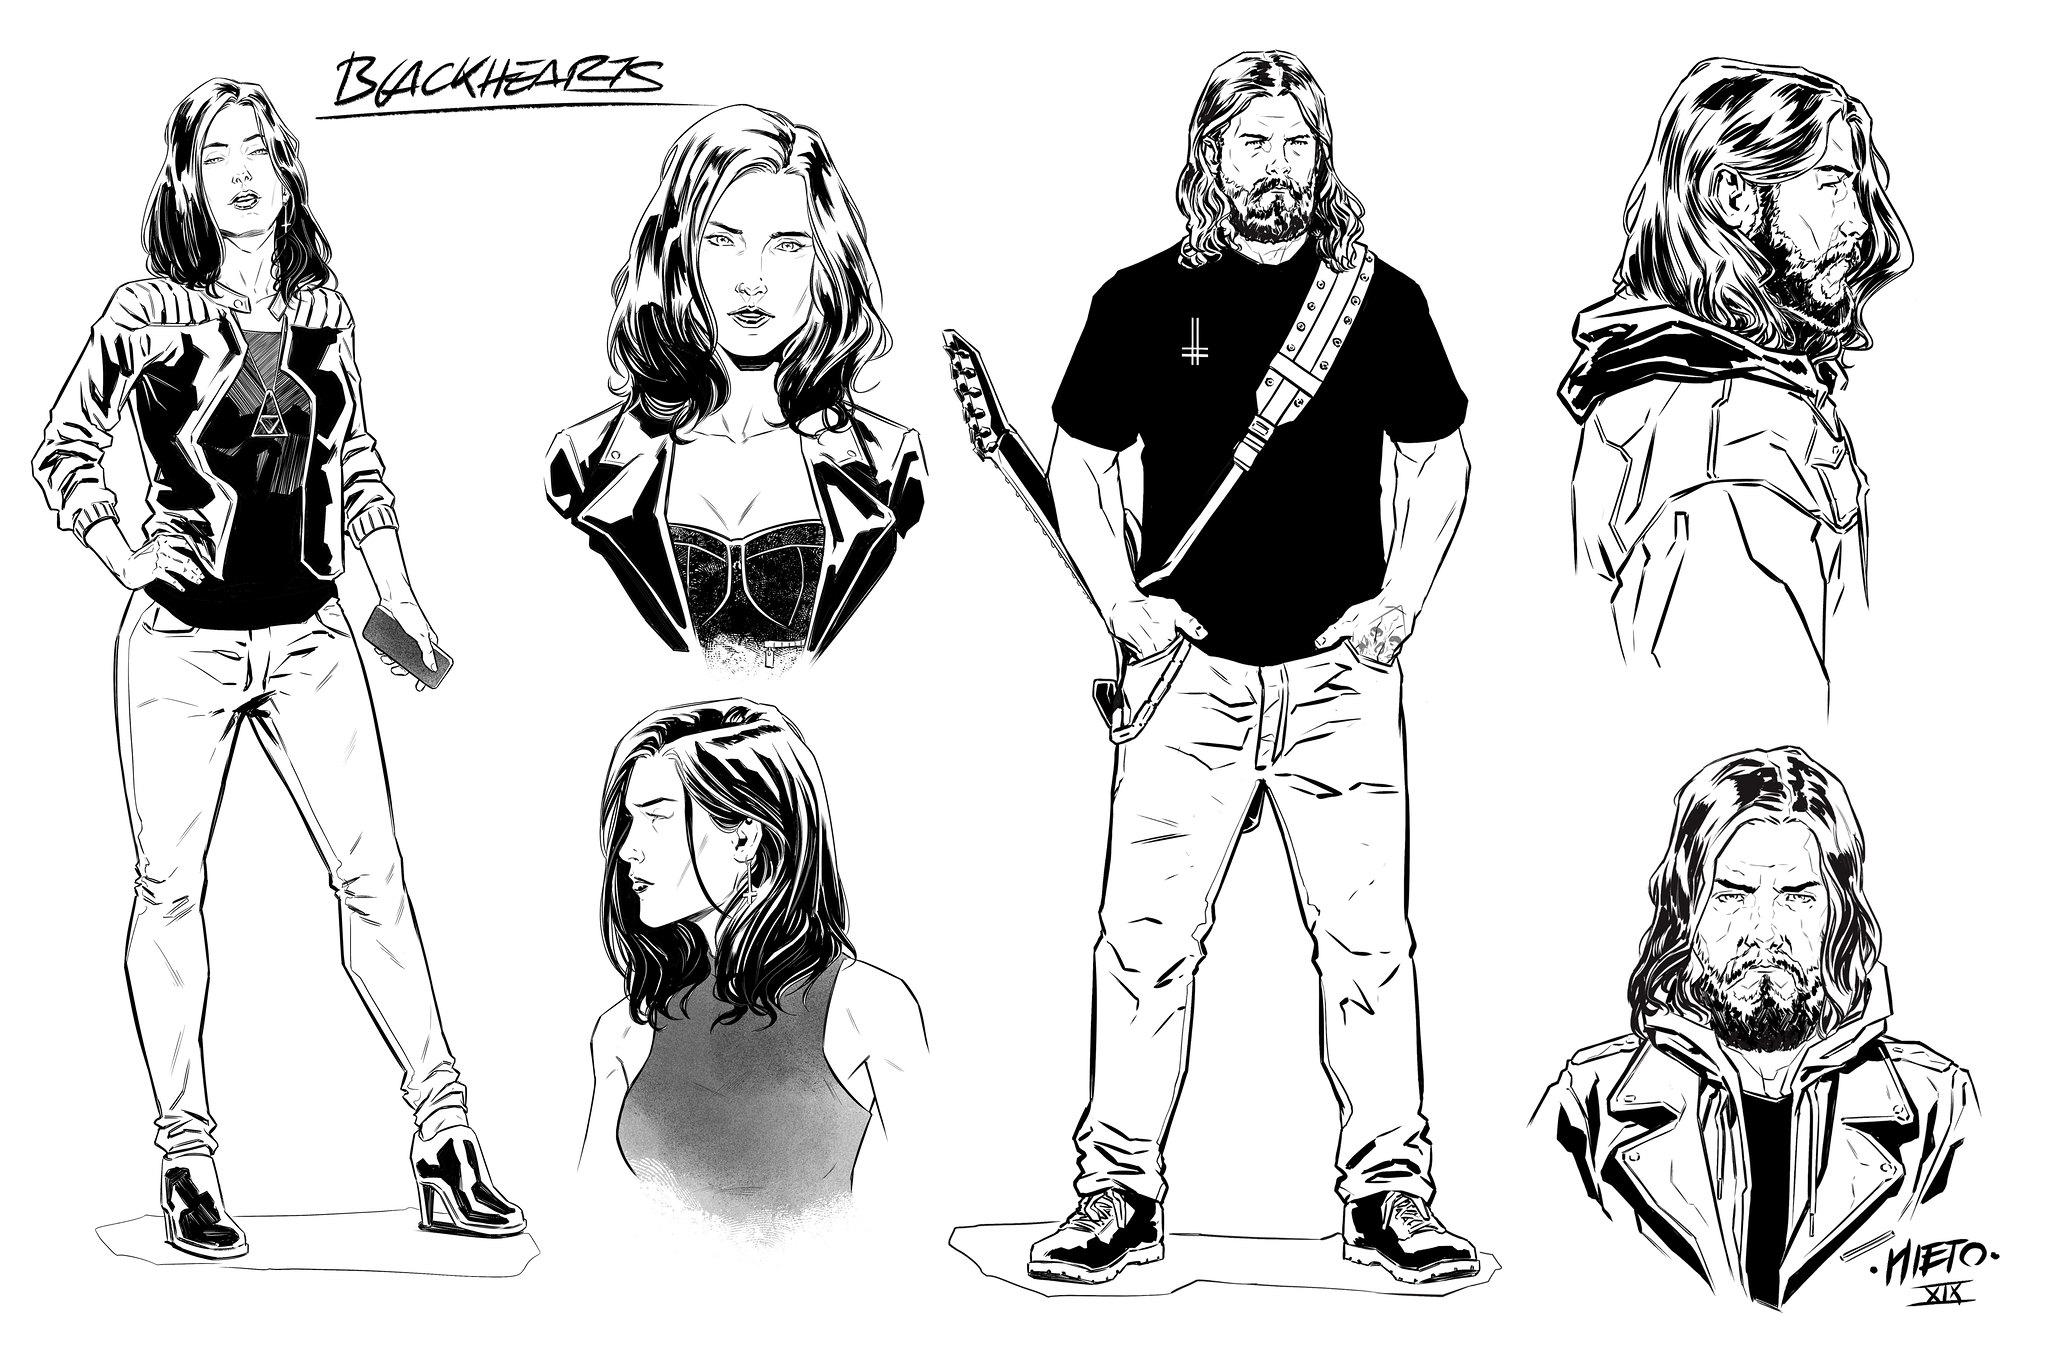 Blackhearts---Protagonistas